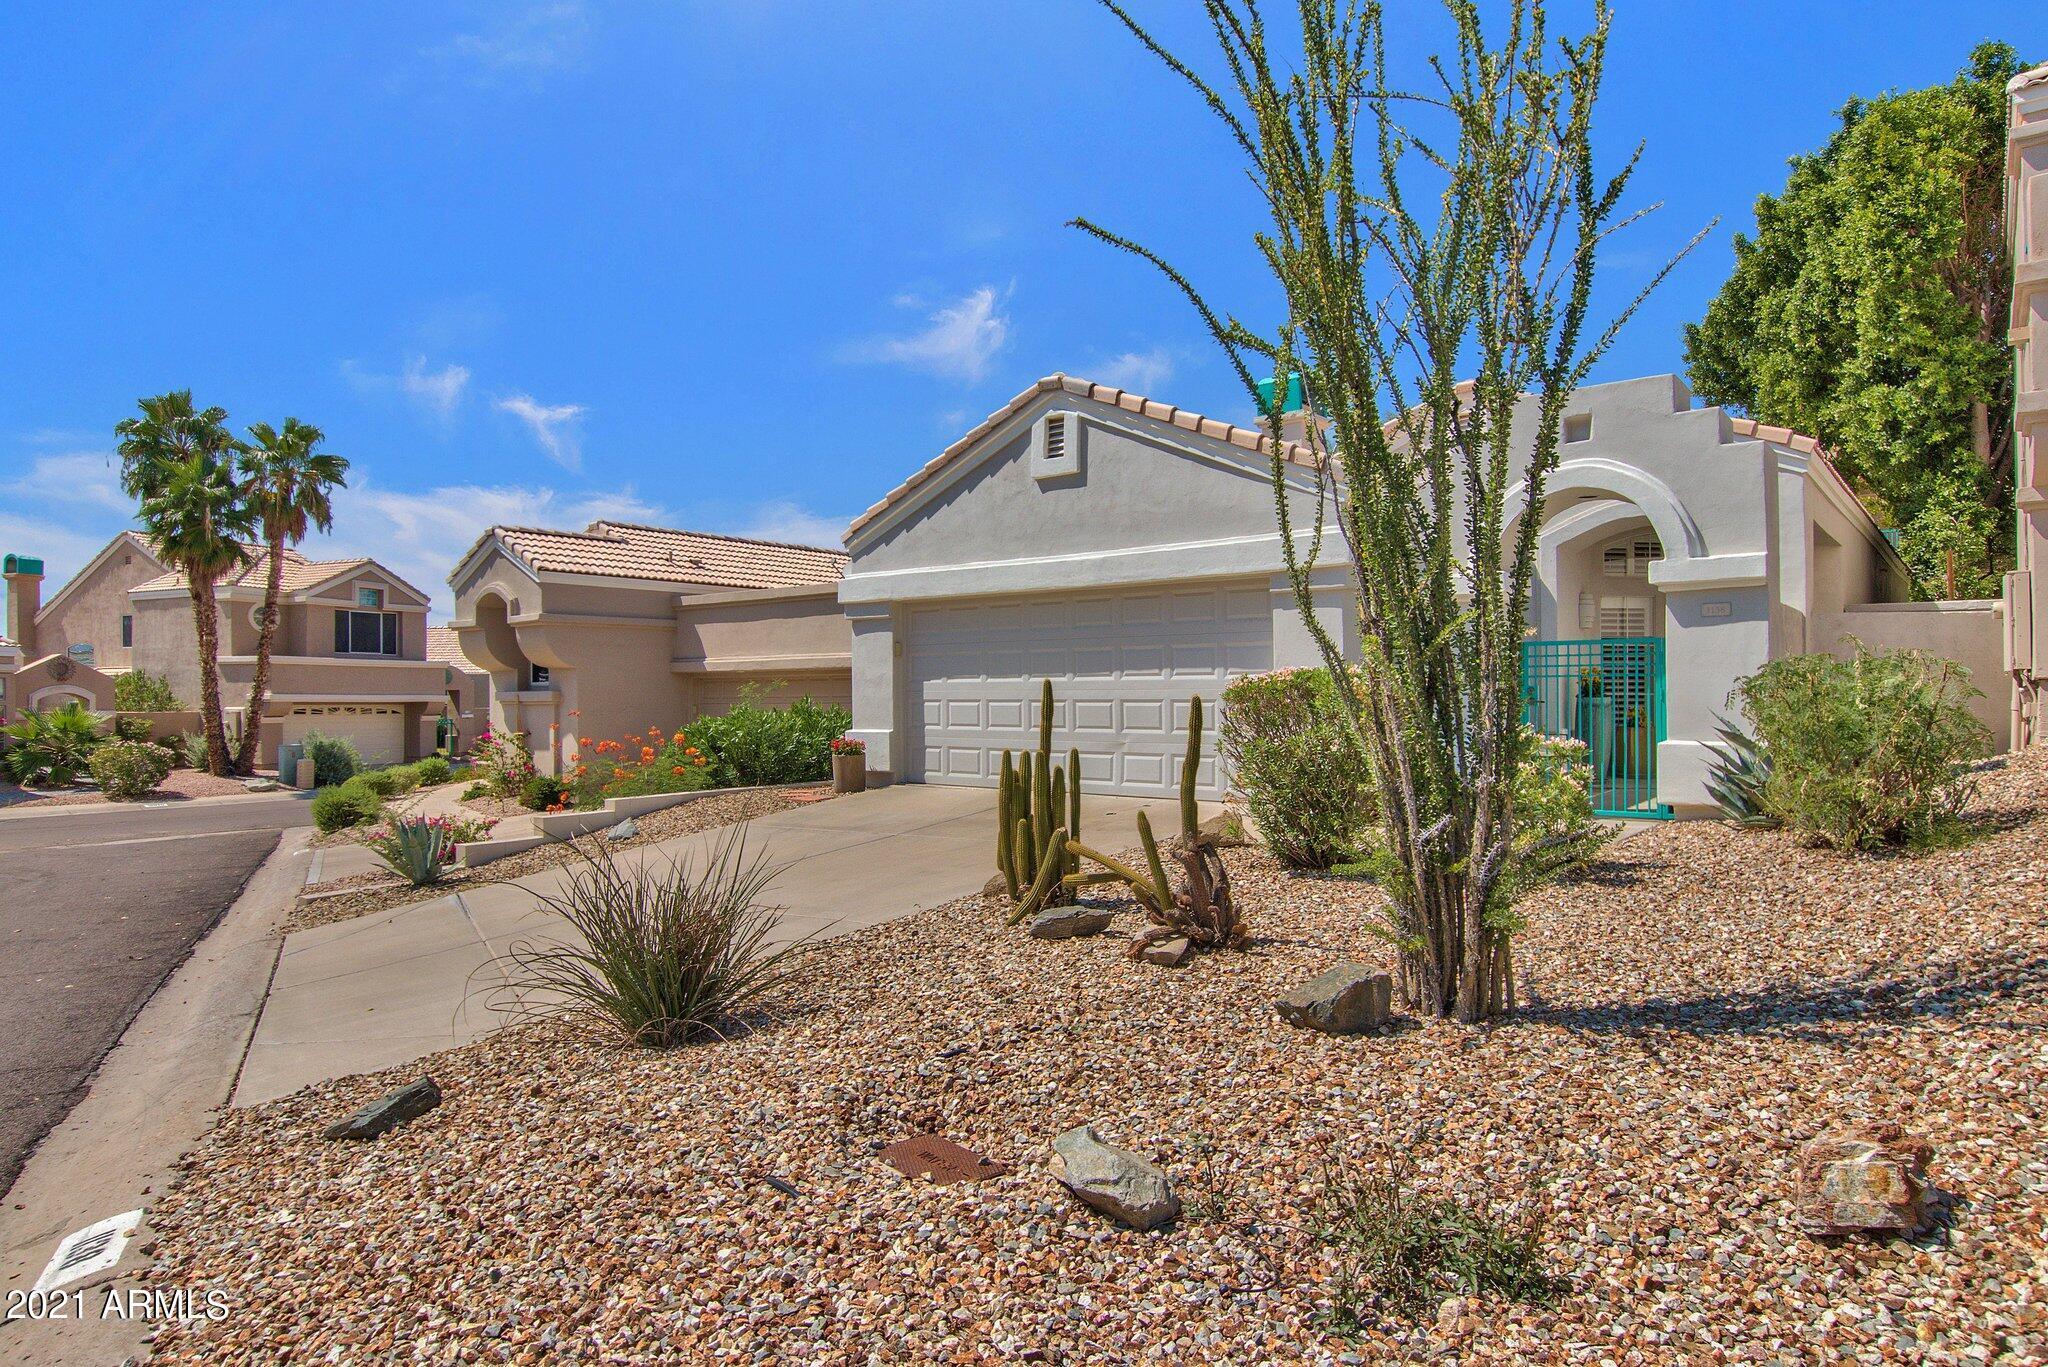 1138 E Amberwood Drive, Phoenix AZ 85048 - Photo 2